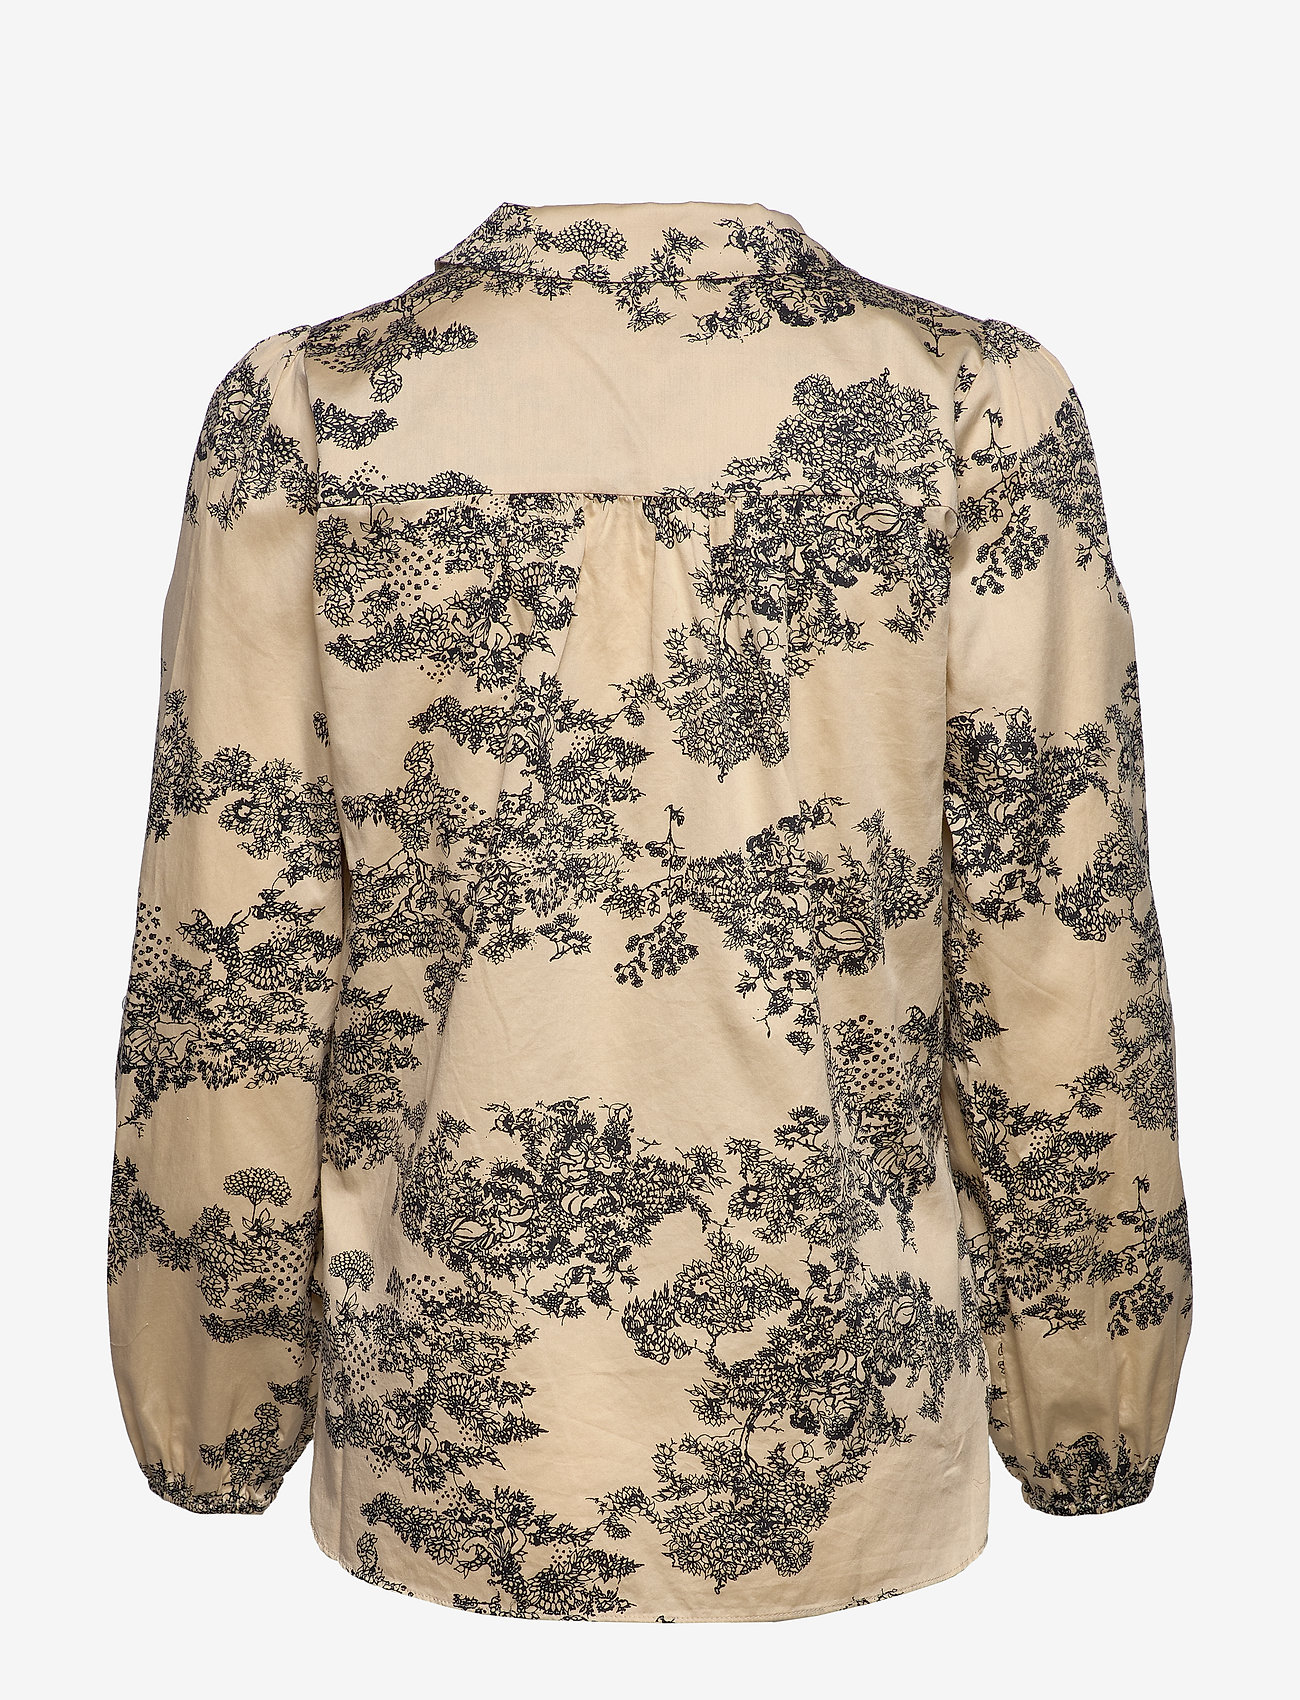 Picnic Ls Shirt (Pebble) (95 €) - Second Female 7C4M8